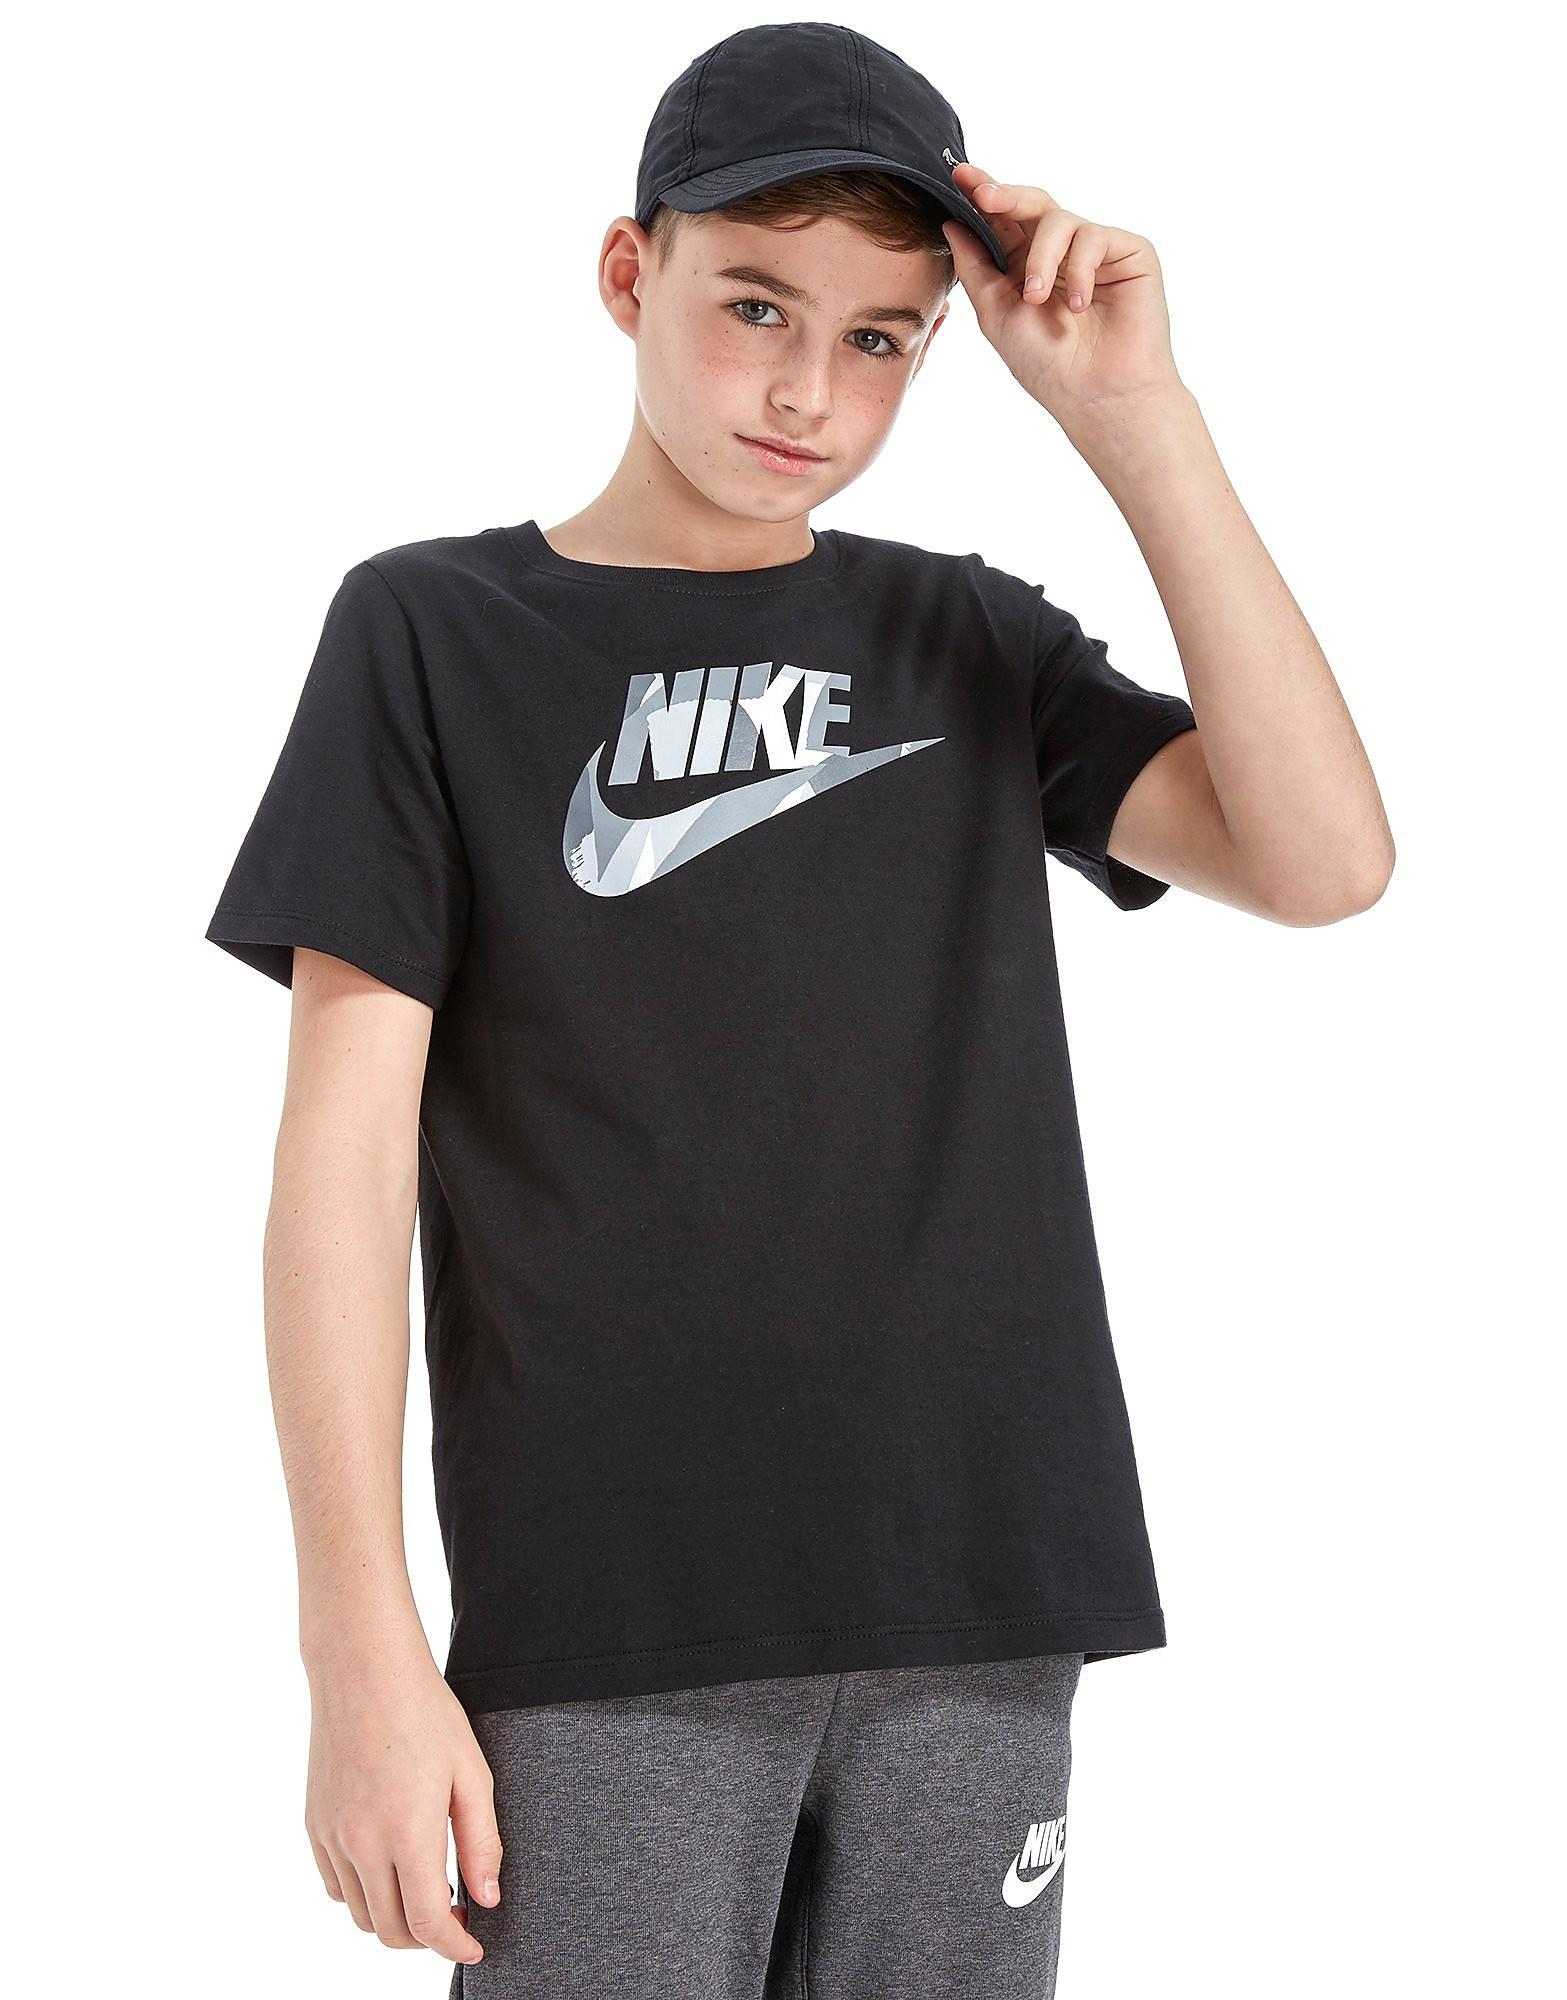 Nike Camo Infill T-Shirt Junior